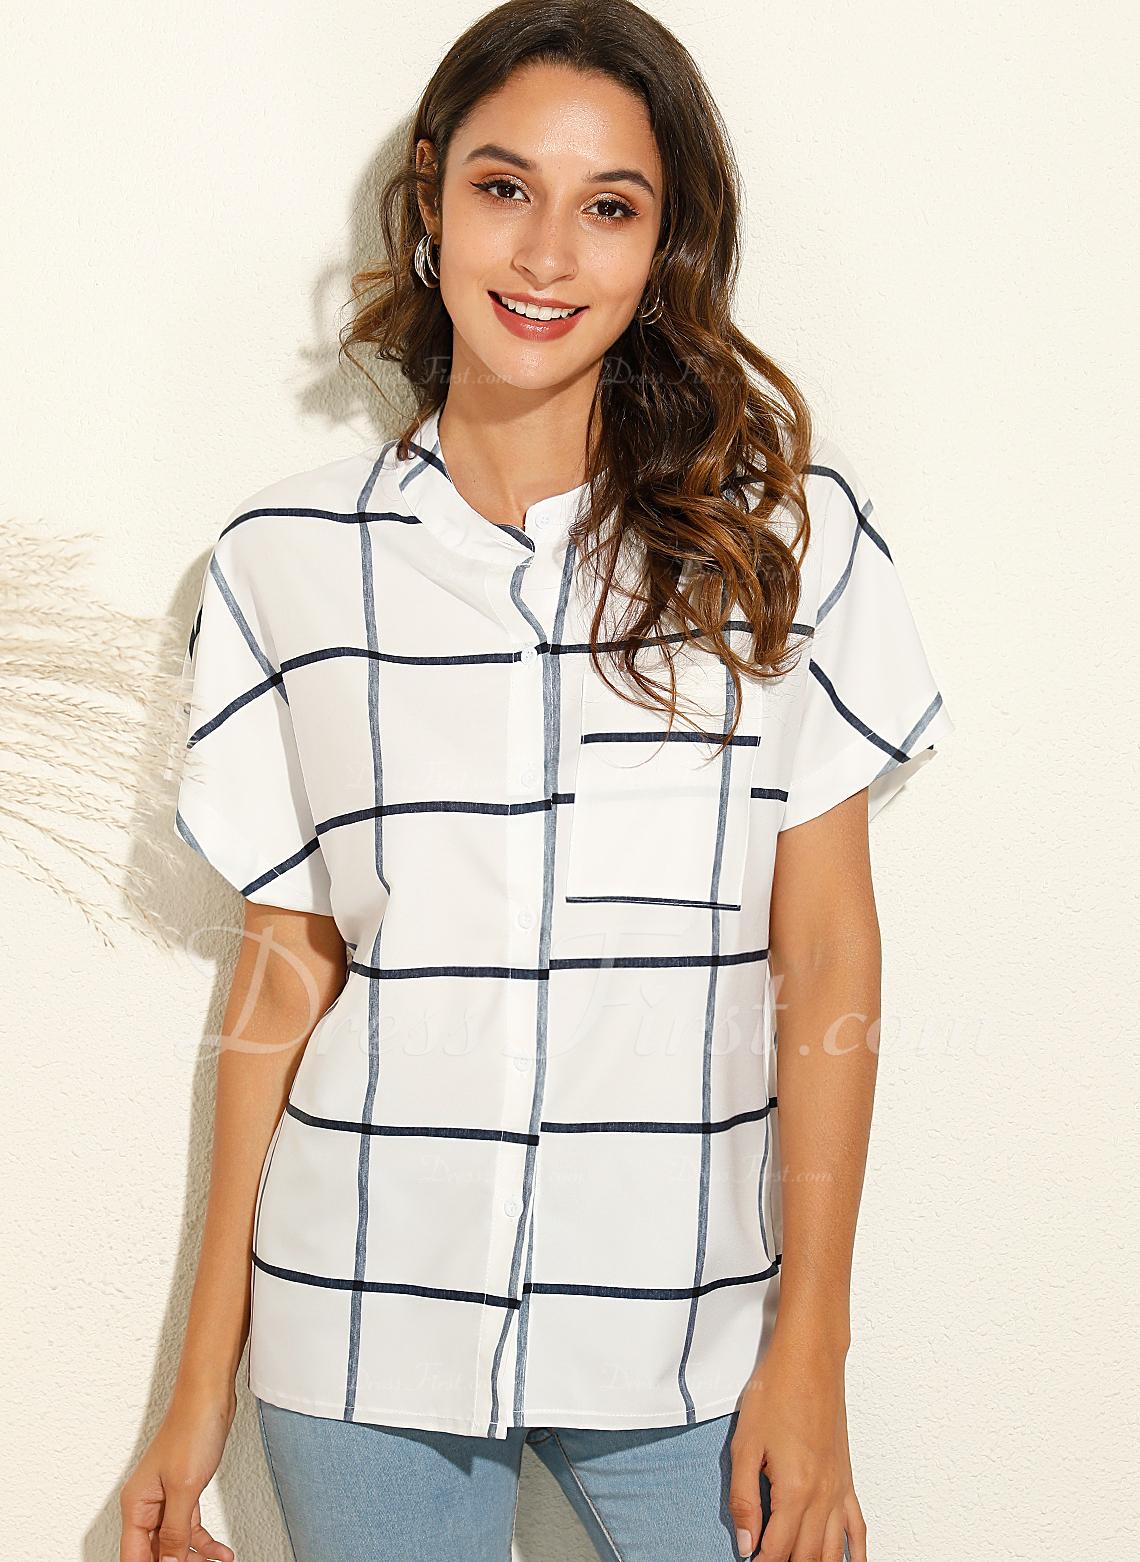 Stampa Scollatura a V Maniche corte Bottone Casuale Shirt and Blouses